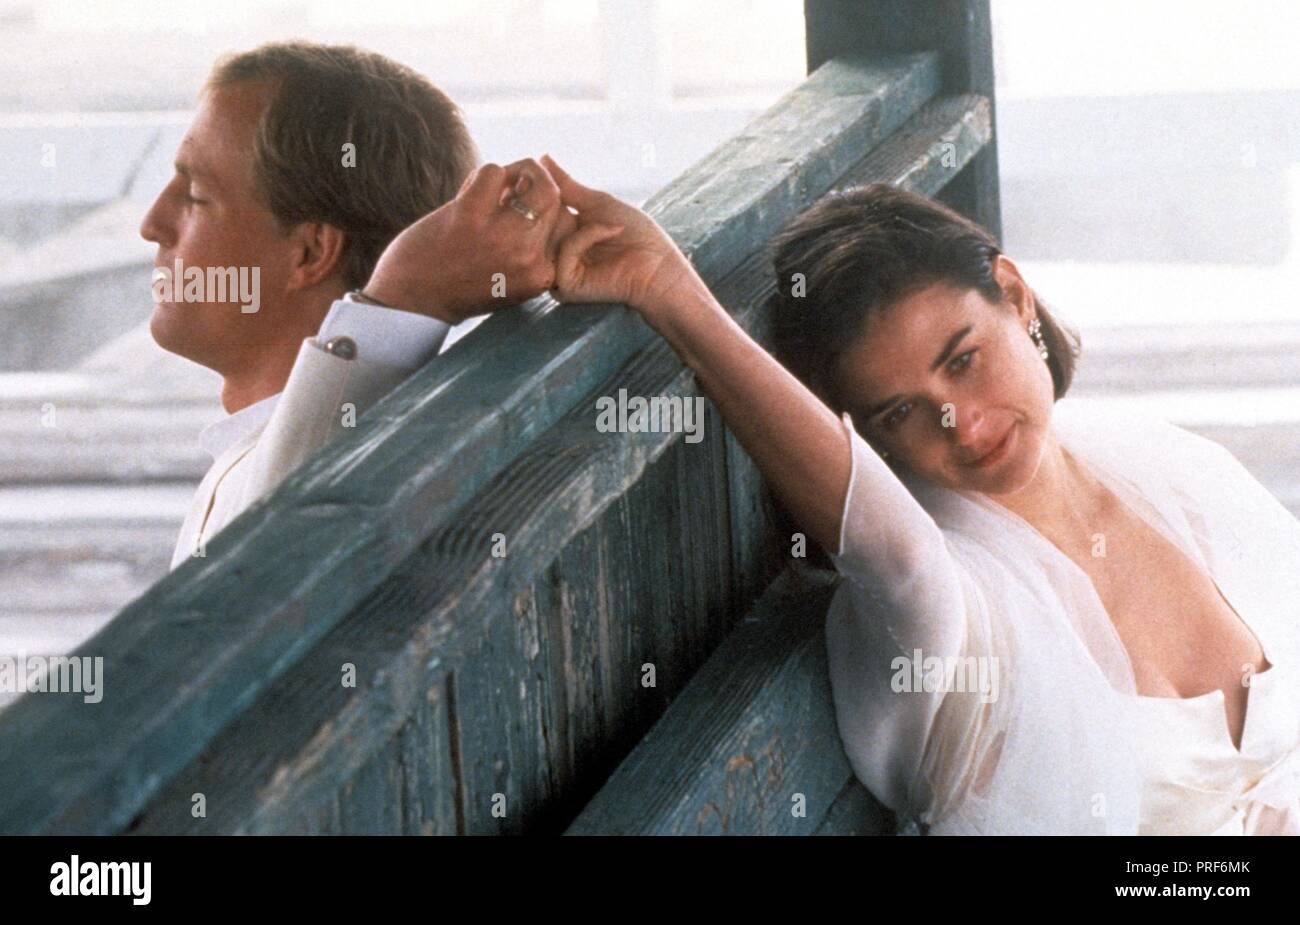 Original film title: INDECENT PROPOSAL. English title: INDECENT PROPOSAL. Year: 1993. Director: ADRIAN LYNE. Stars: DEMI MOORE; WOODY HARRELSON. Credit: PARAMOUNT PICTURES / Album - Stock Image